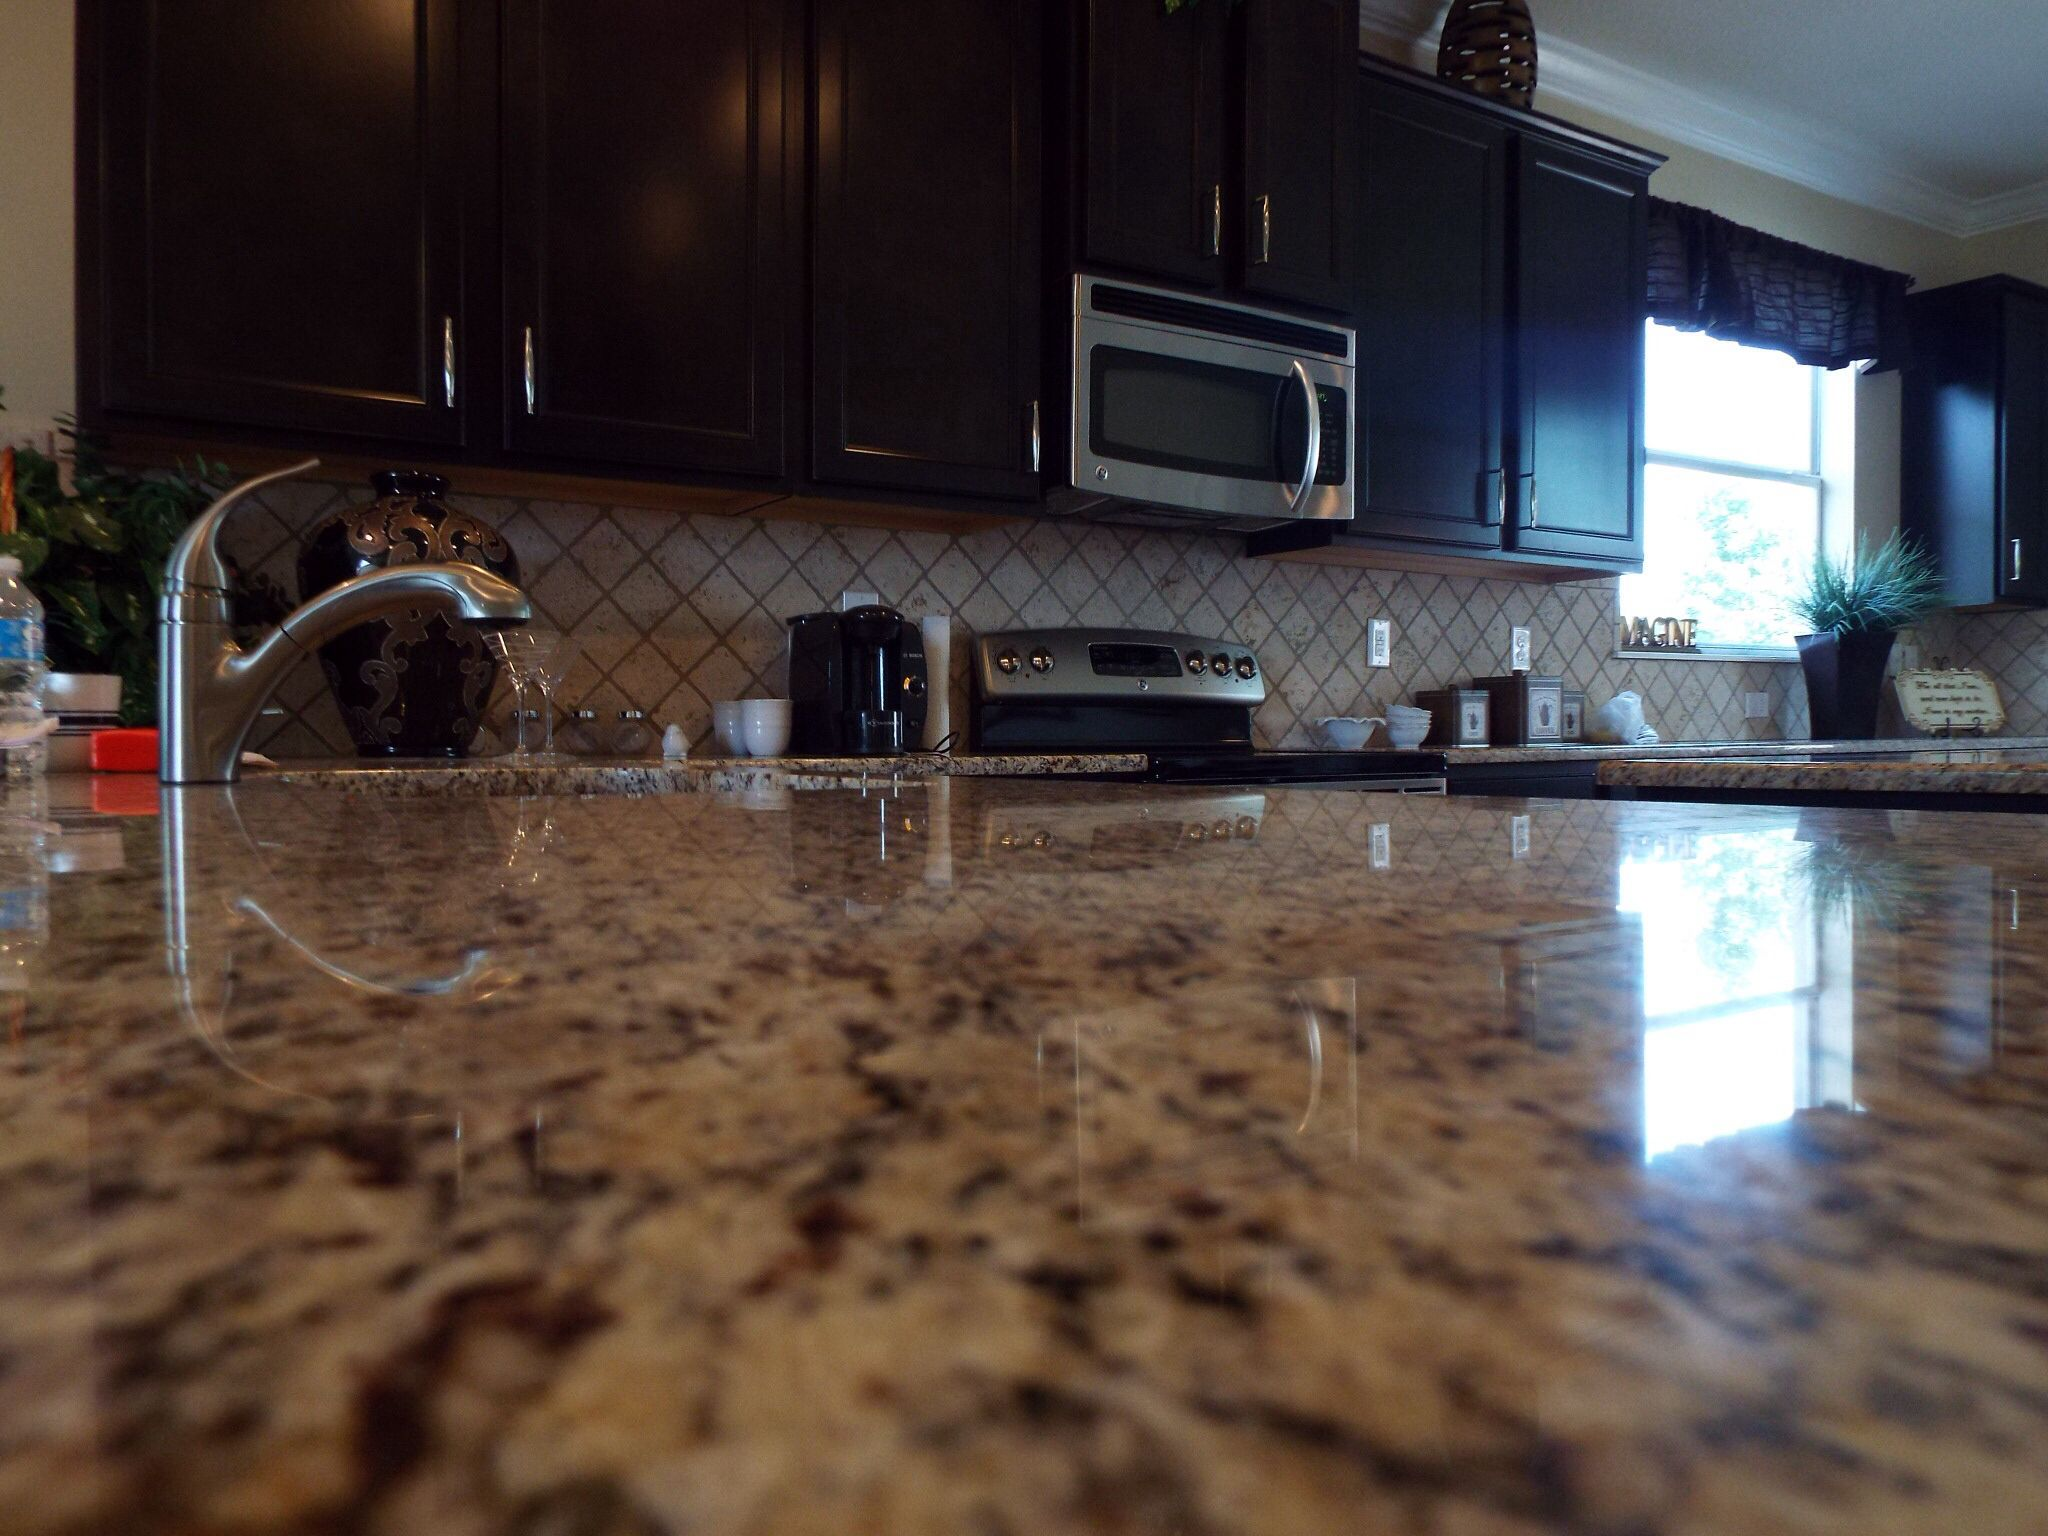 Granite Countertops Sarsaparilla Color Aristakrat Cabinets In D R Horton S Homes Tampa Florida Andy Fernandez